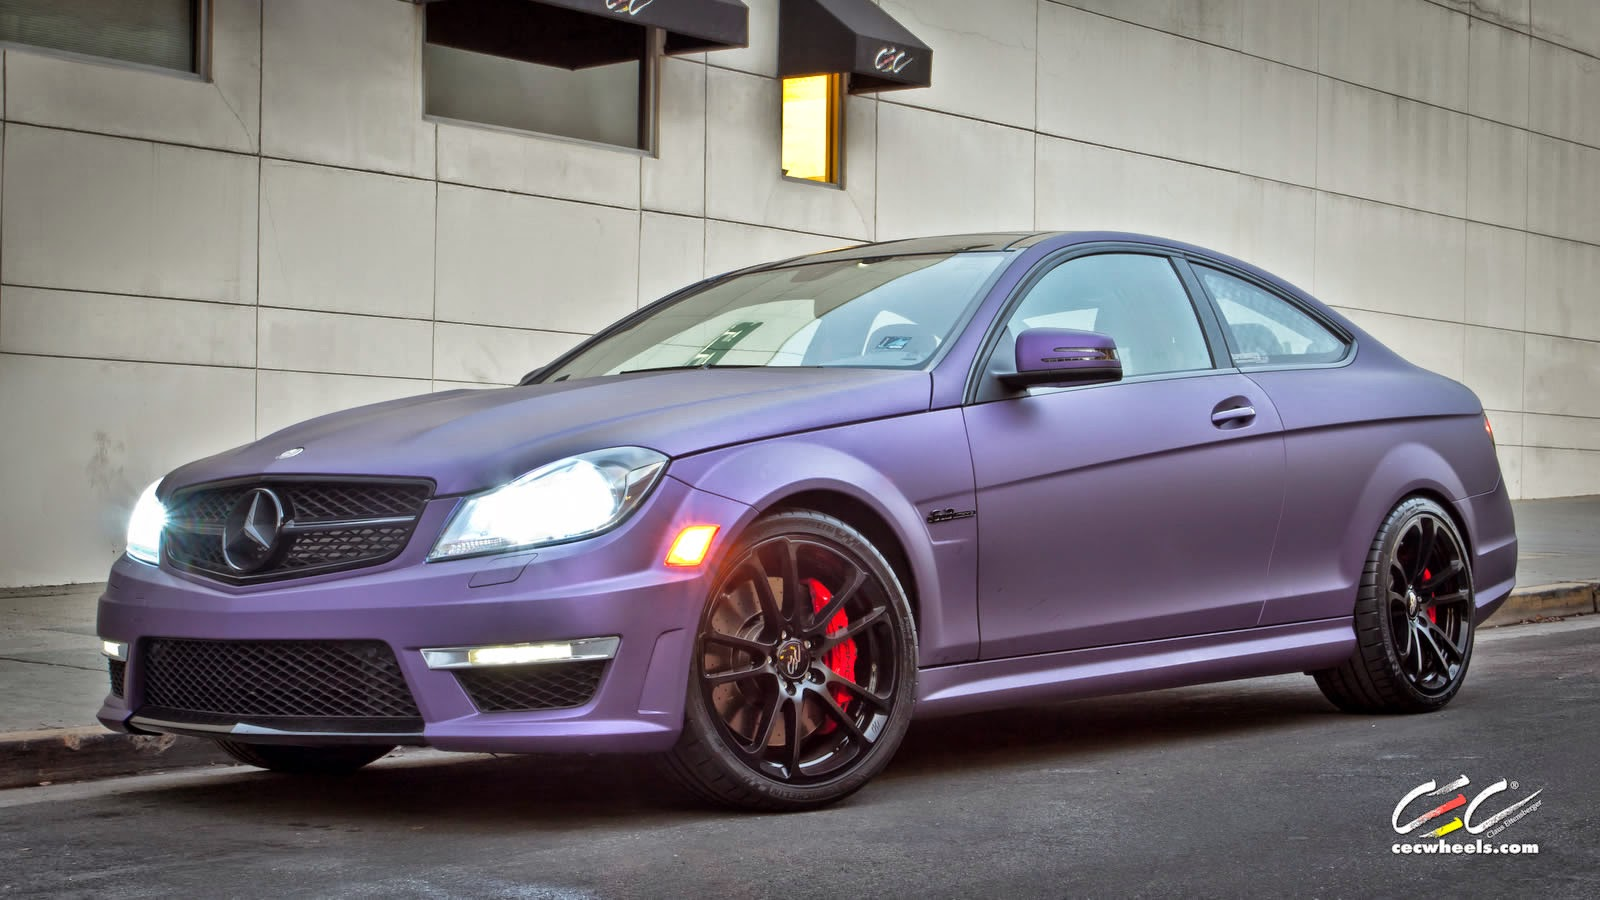 mercedes benz w204 c63 amg coupe purple matte on cec wheels benztuning. Black Bedroom Furniture Sets. Home Design Ideas